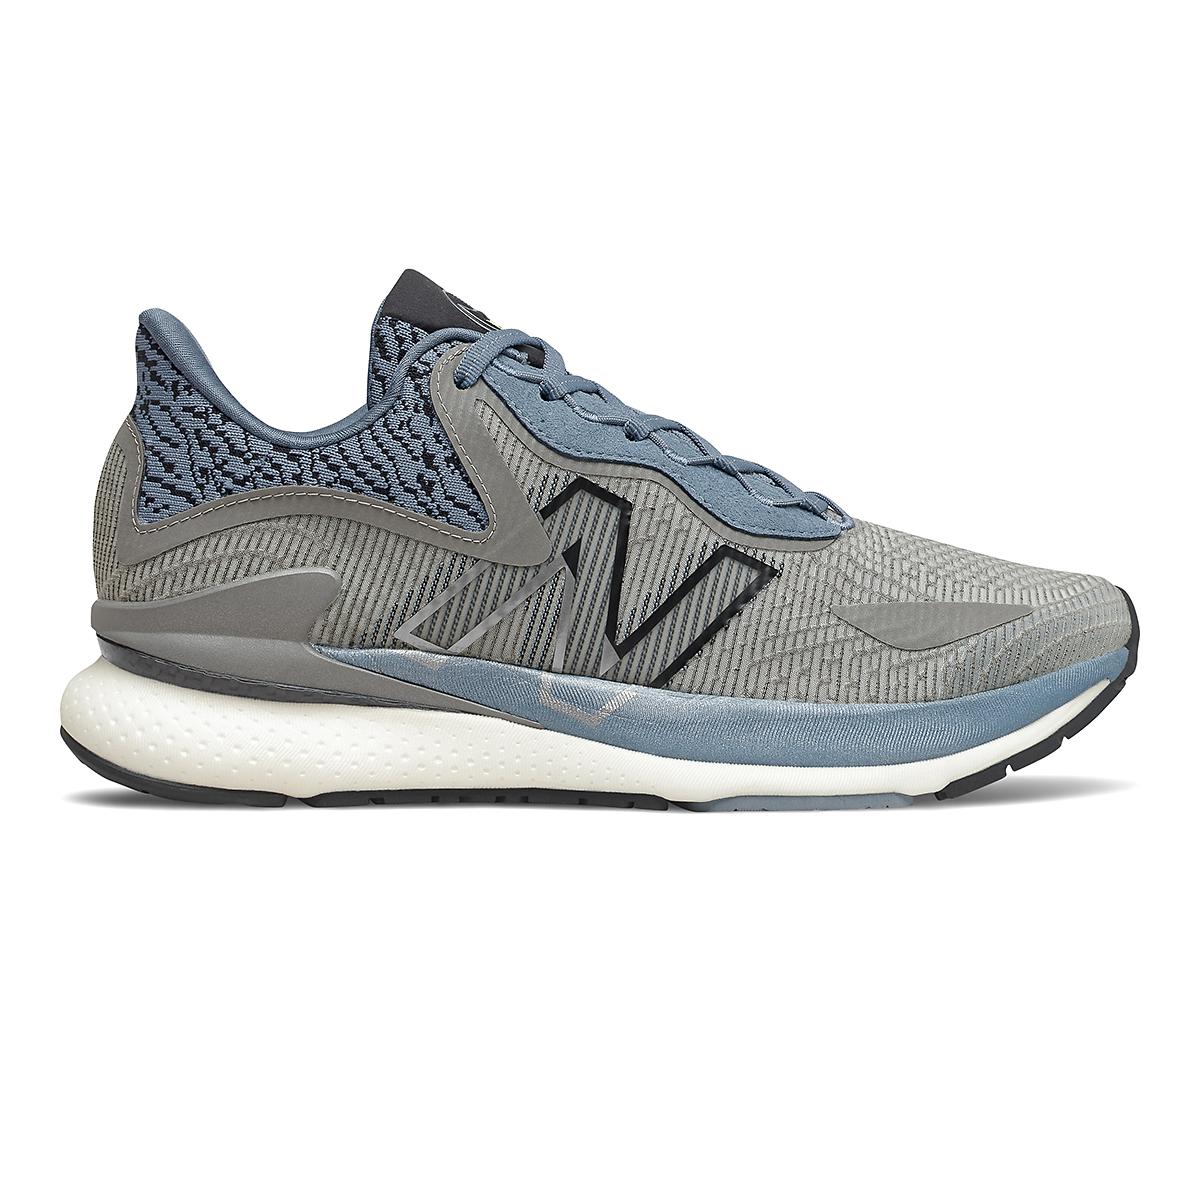 Men's New Balance Lerato Running Shoe, , large, image 1